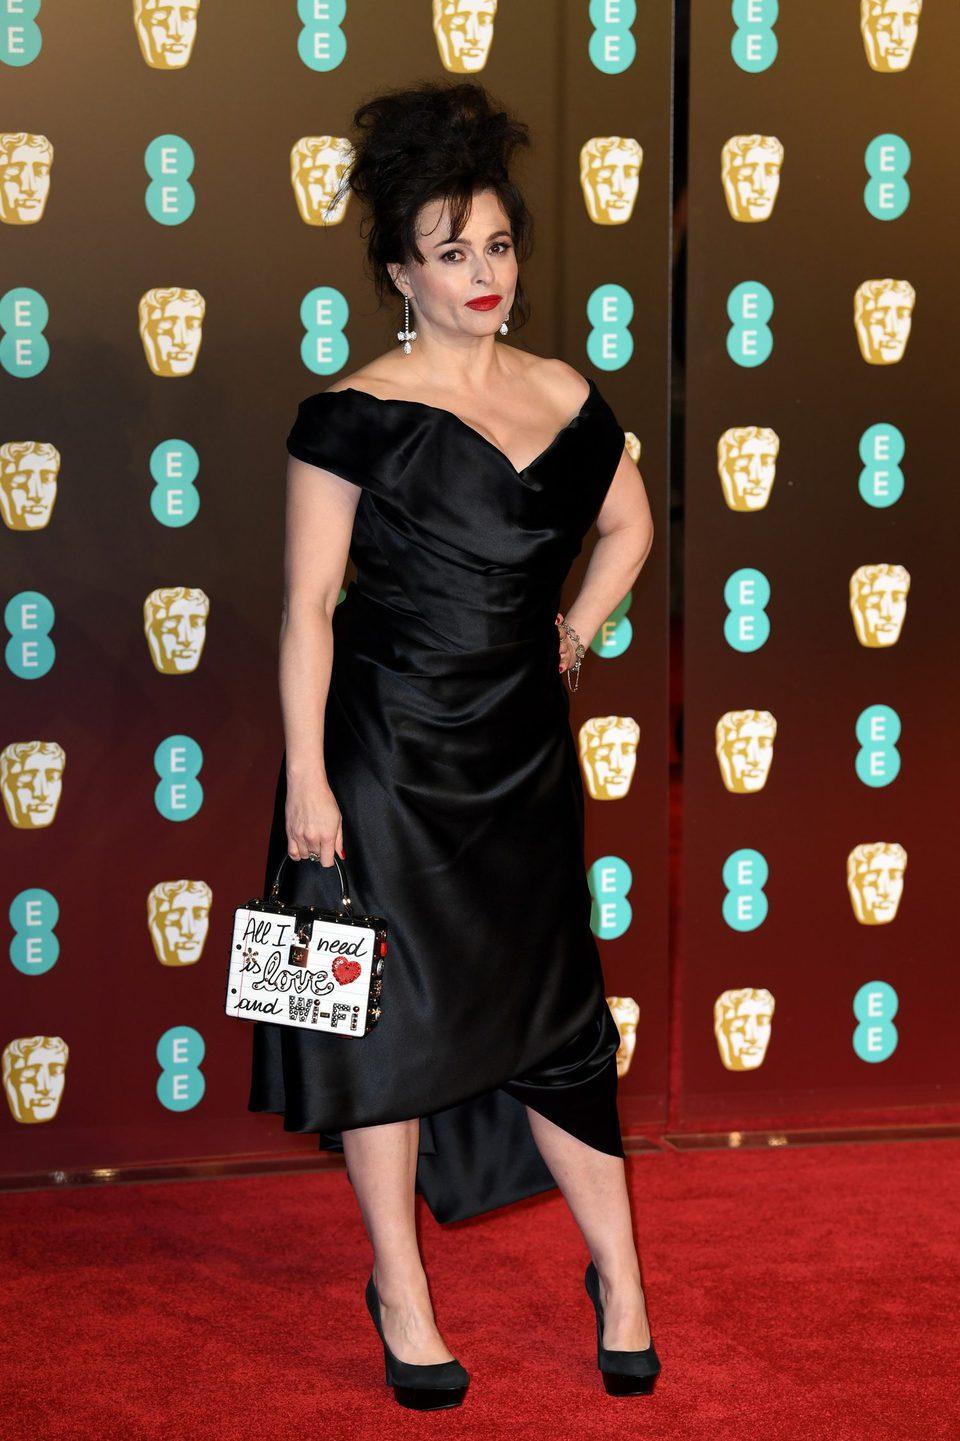 Helena Bonham Carter at the BAFTAs 2018 red carpet